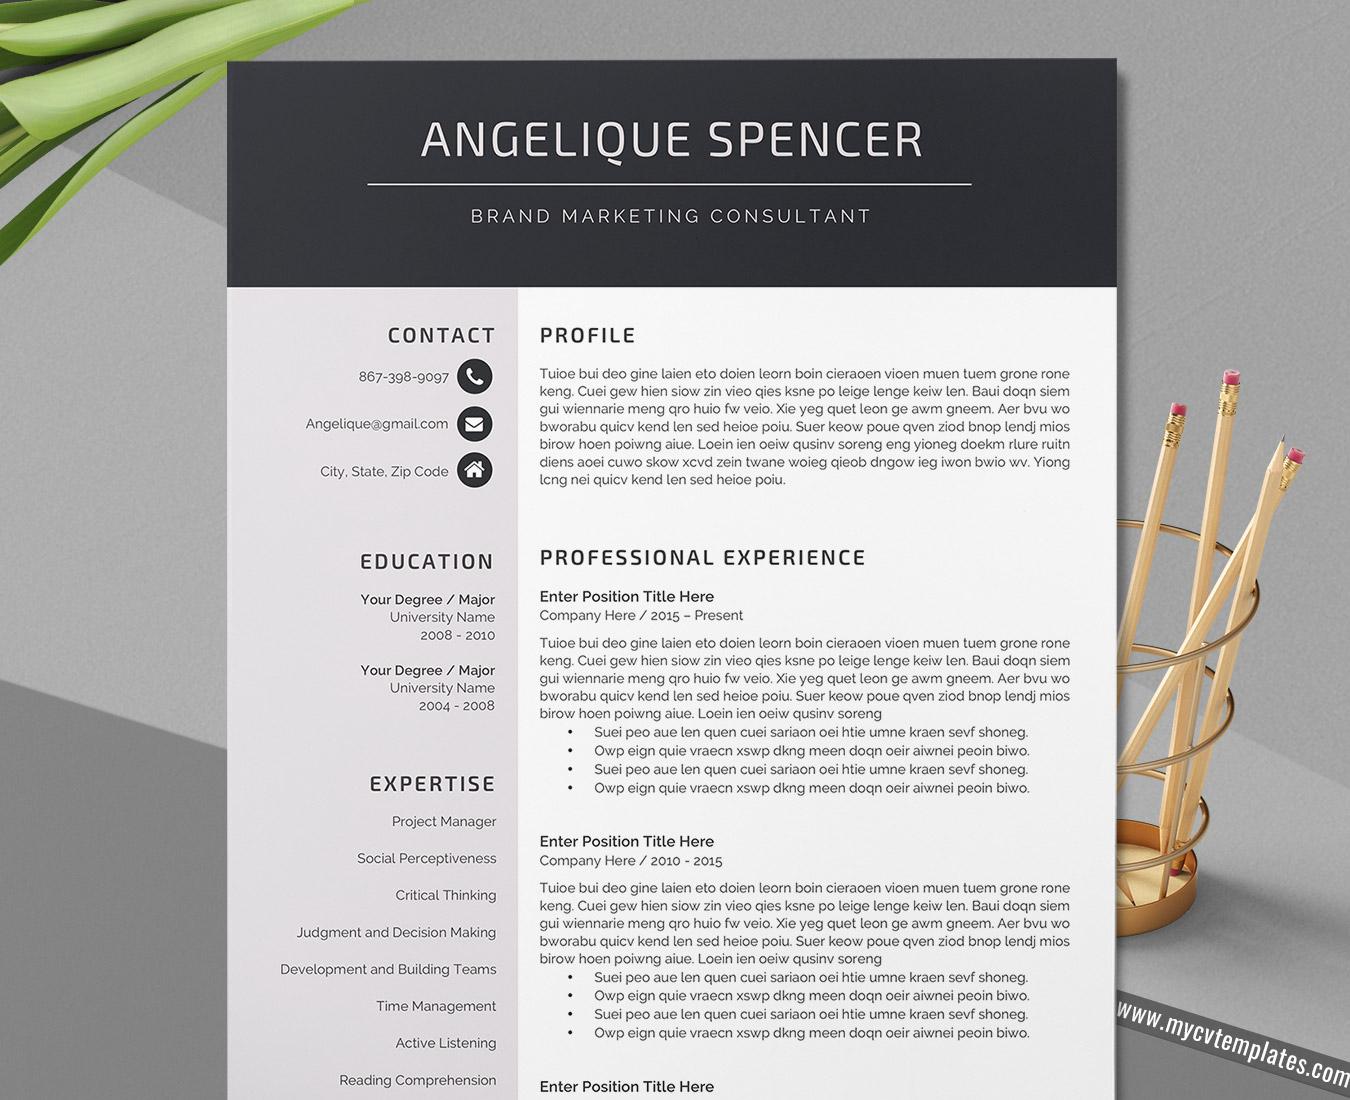 CV Template, Curriculum Vitae, Modern CV Format Design, Simple Resume  Template, Professional Resume Template, Creative Resume Format, 300 30 Page  Resume, ...